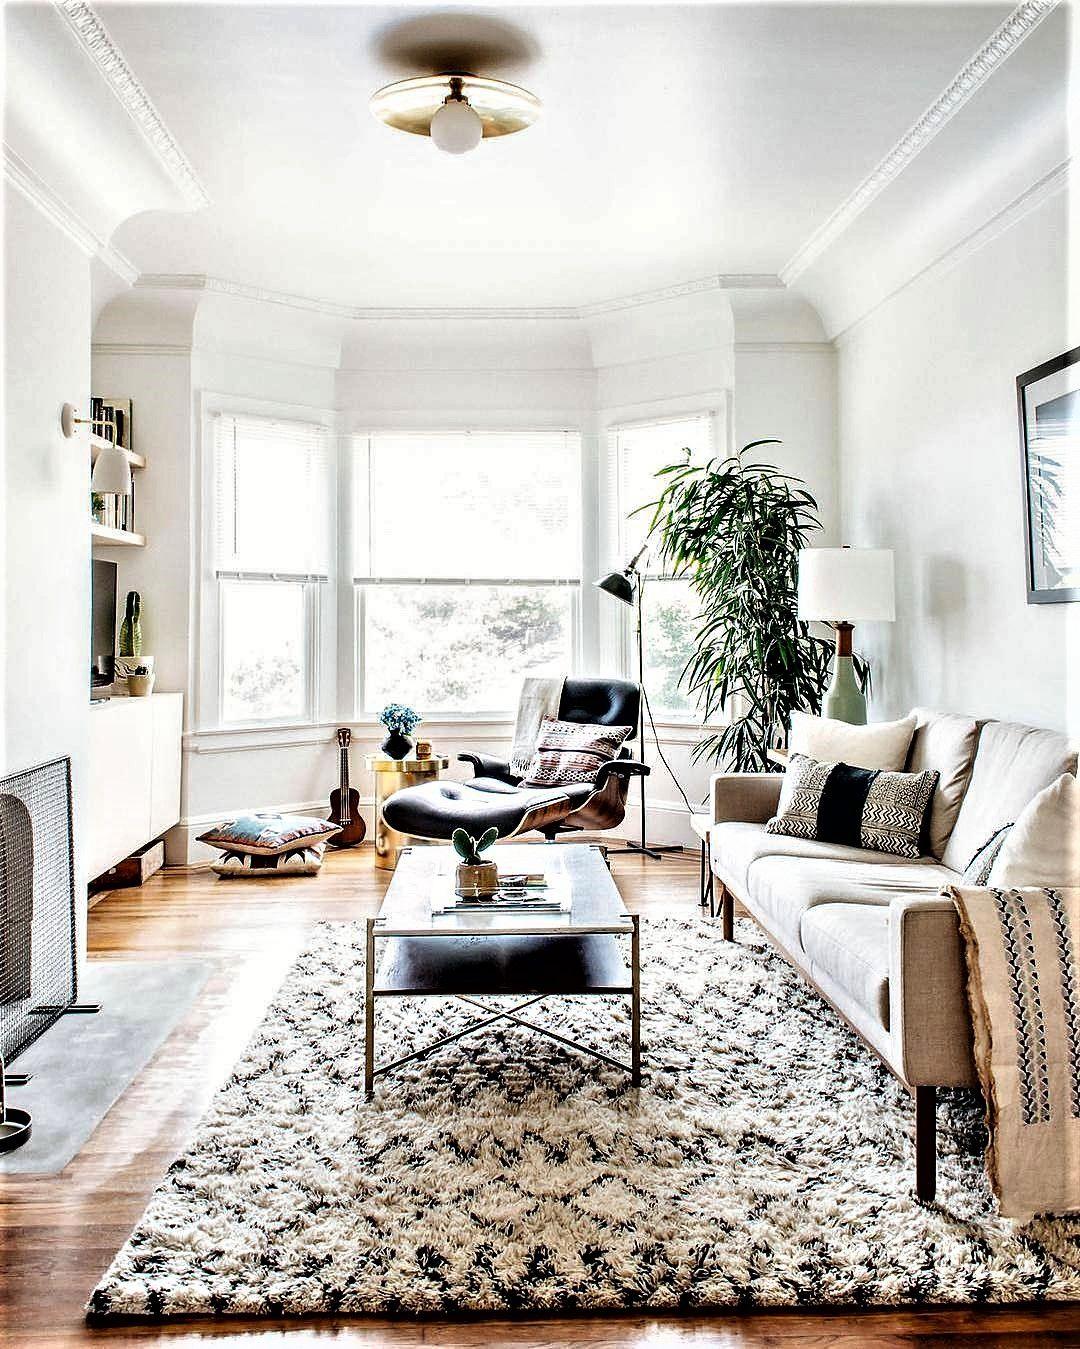 Pin by Naomi Miatkowska on Sweet | Pinterest | Living rooms ...